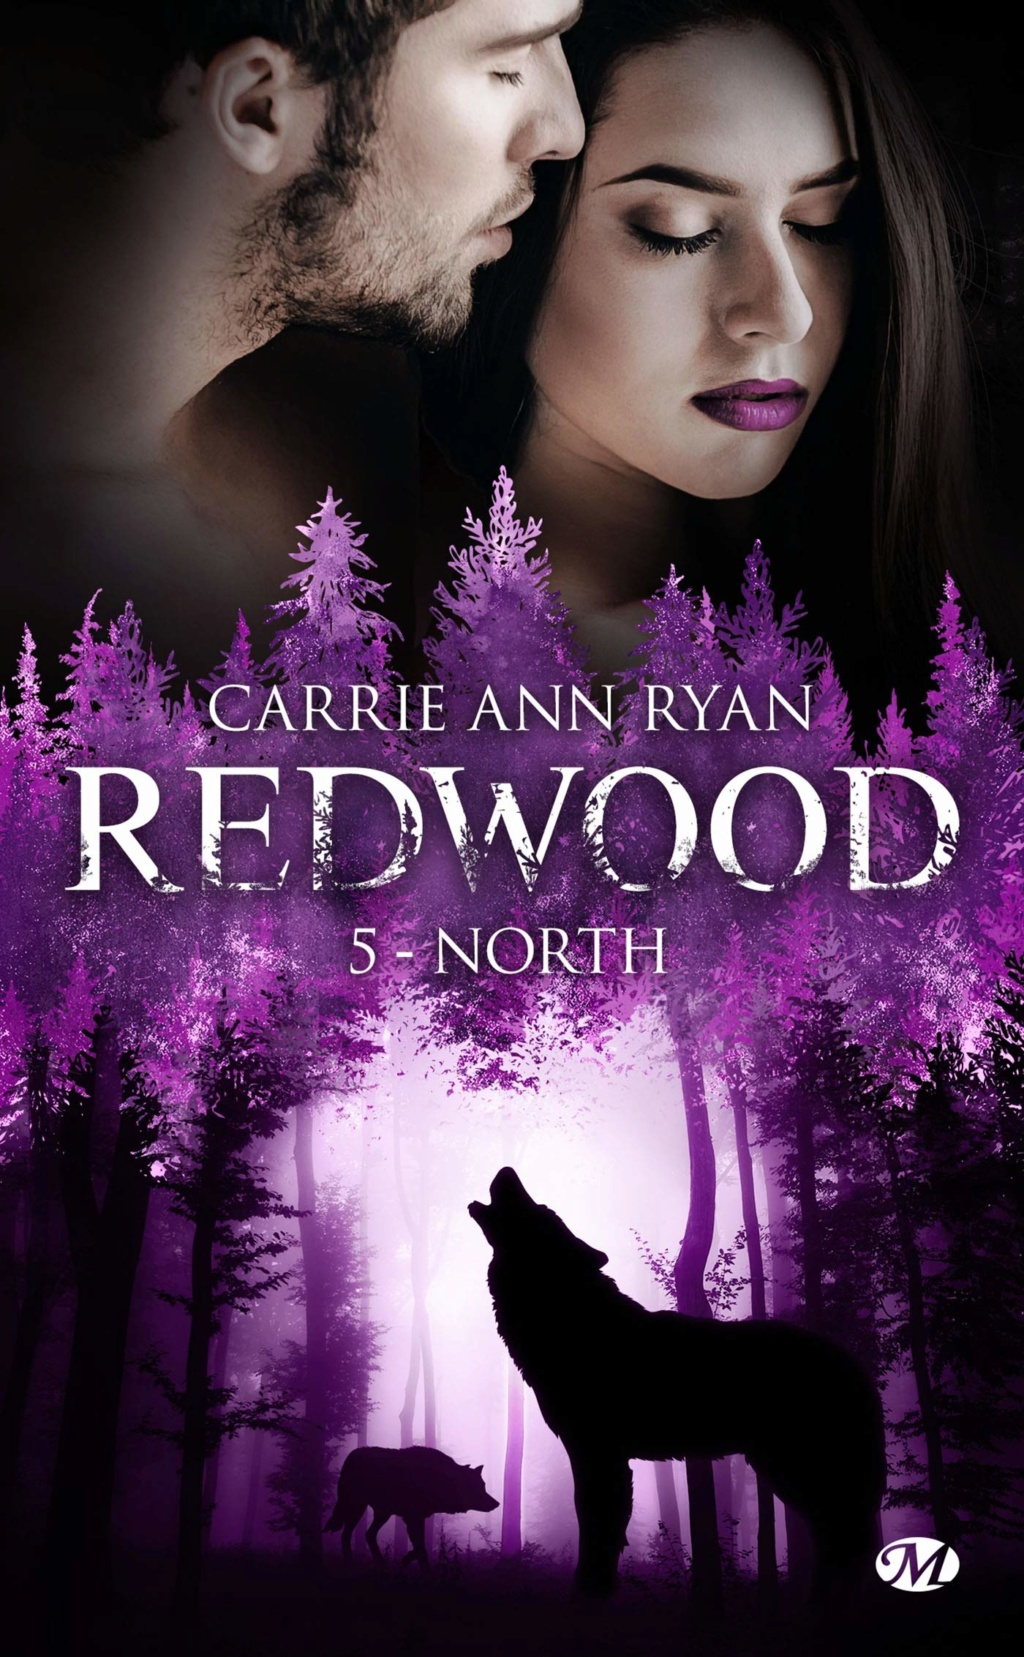 Redwood - Tome 5 : North de Carrie Ann Ryan Redwoo10